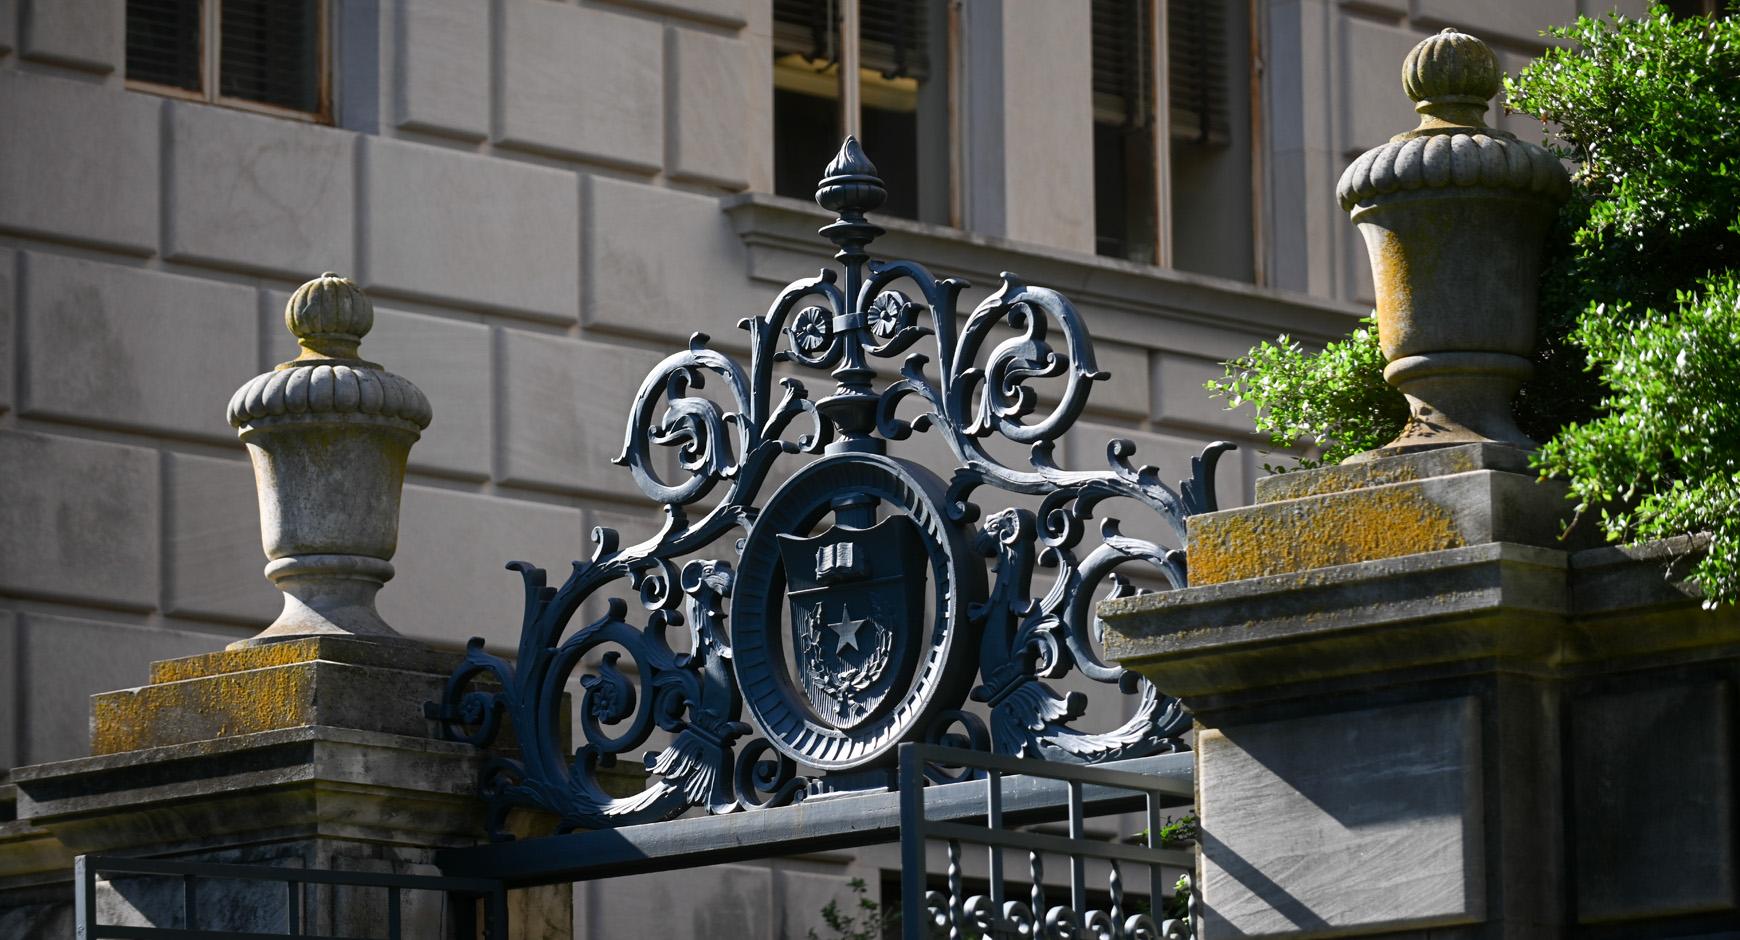 Main building exterior gate and pillar detail